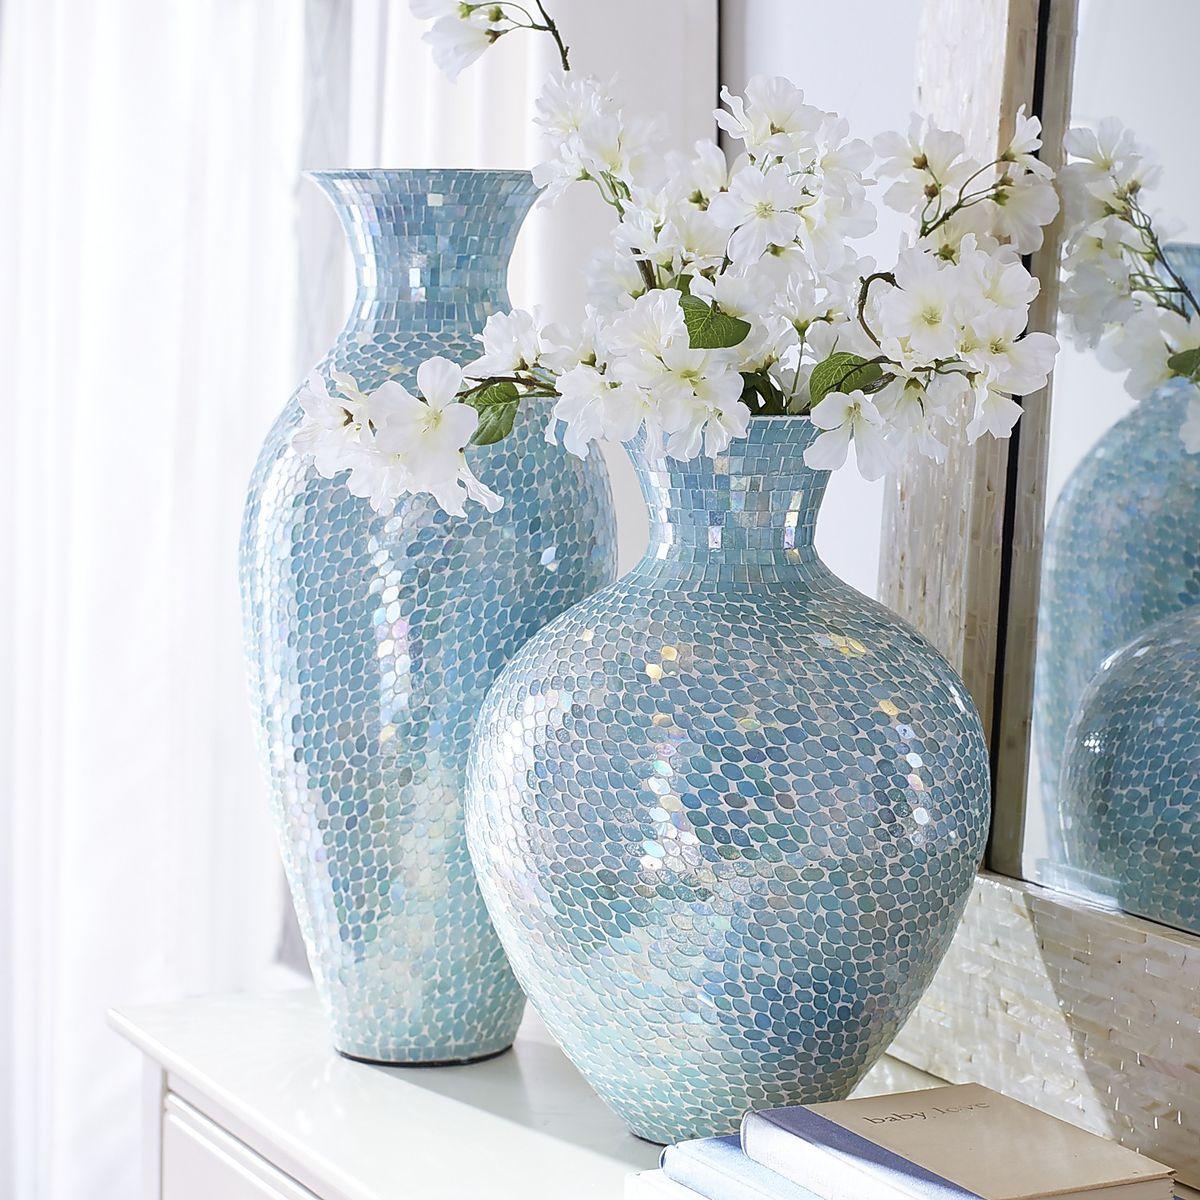 Aqua Mosaic Vases Pier 1 Imports Spectacular Handcrafted Iron Vases Clad In Glittering Glass Mosaic Bring A Sun Kissed Ocean Vi Mosaic Vase Vases Decor Vase